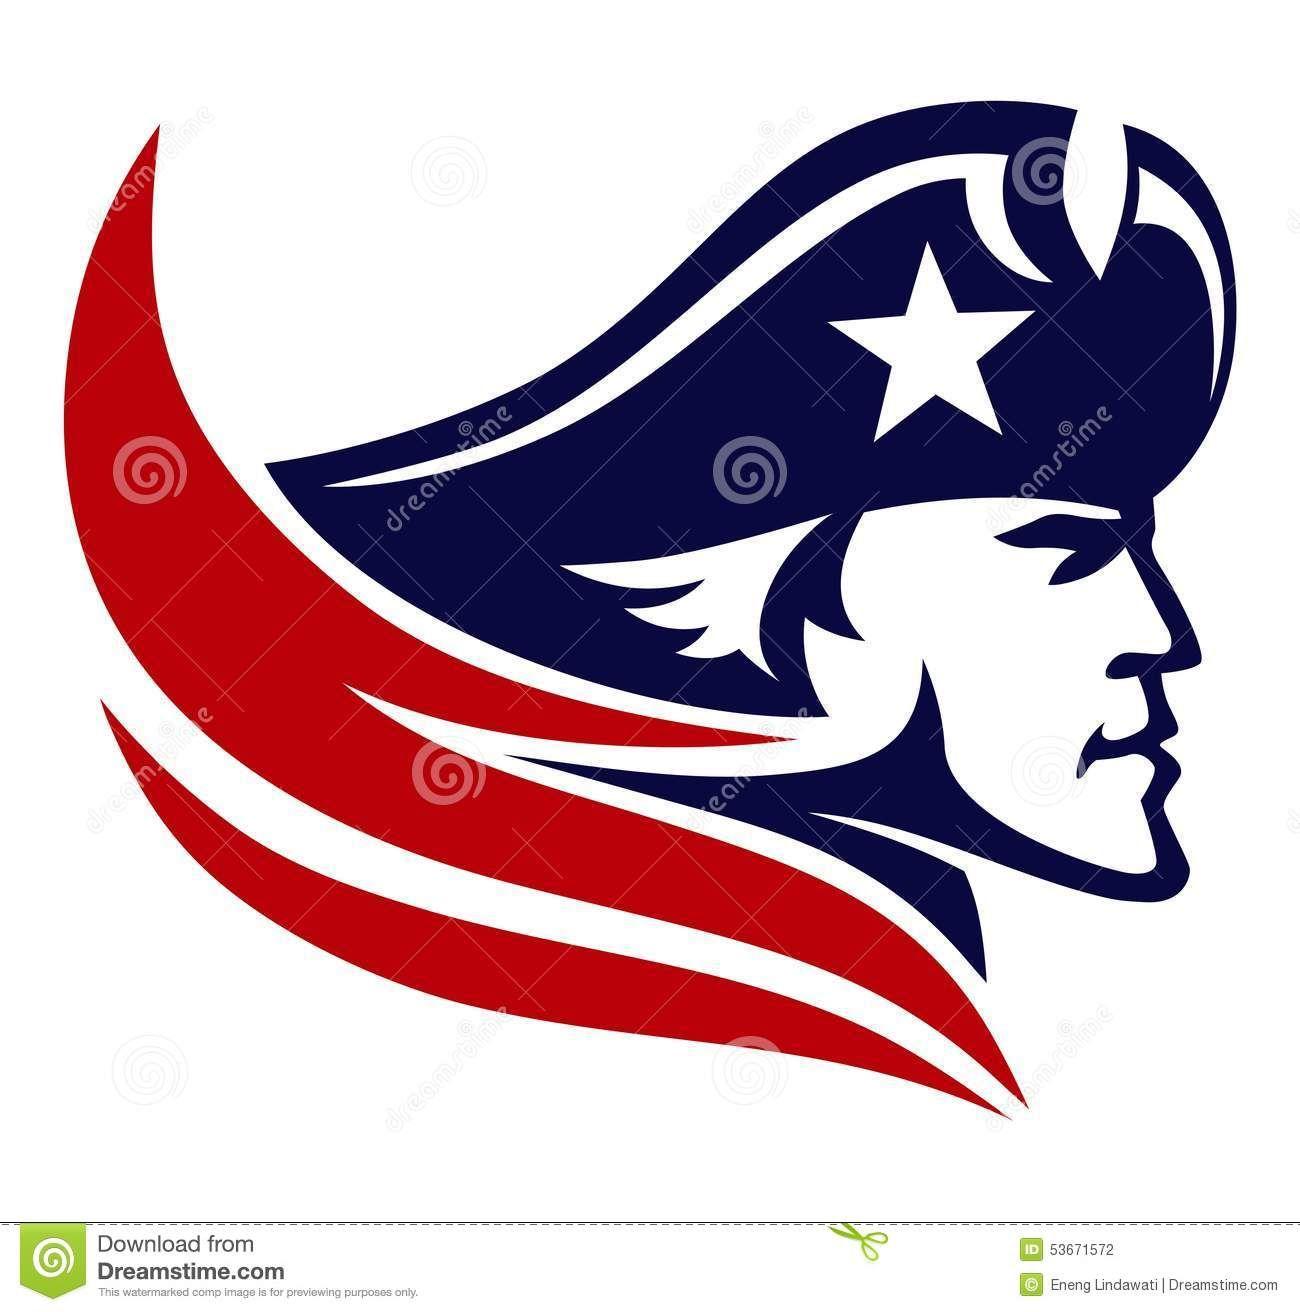 Image Result For American Revolutionary War Flags Patriots War Flag American Revolutionary War Patriotic Images